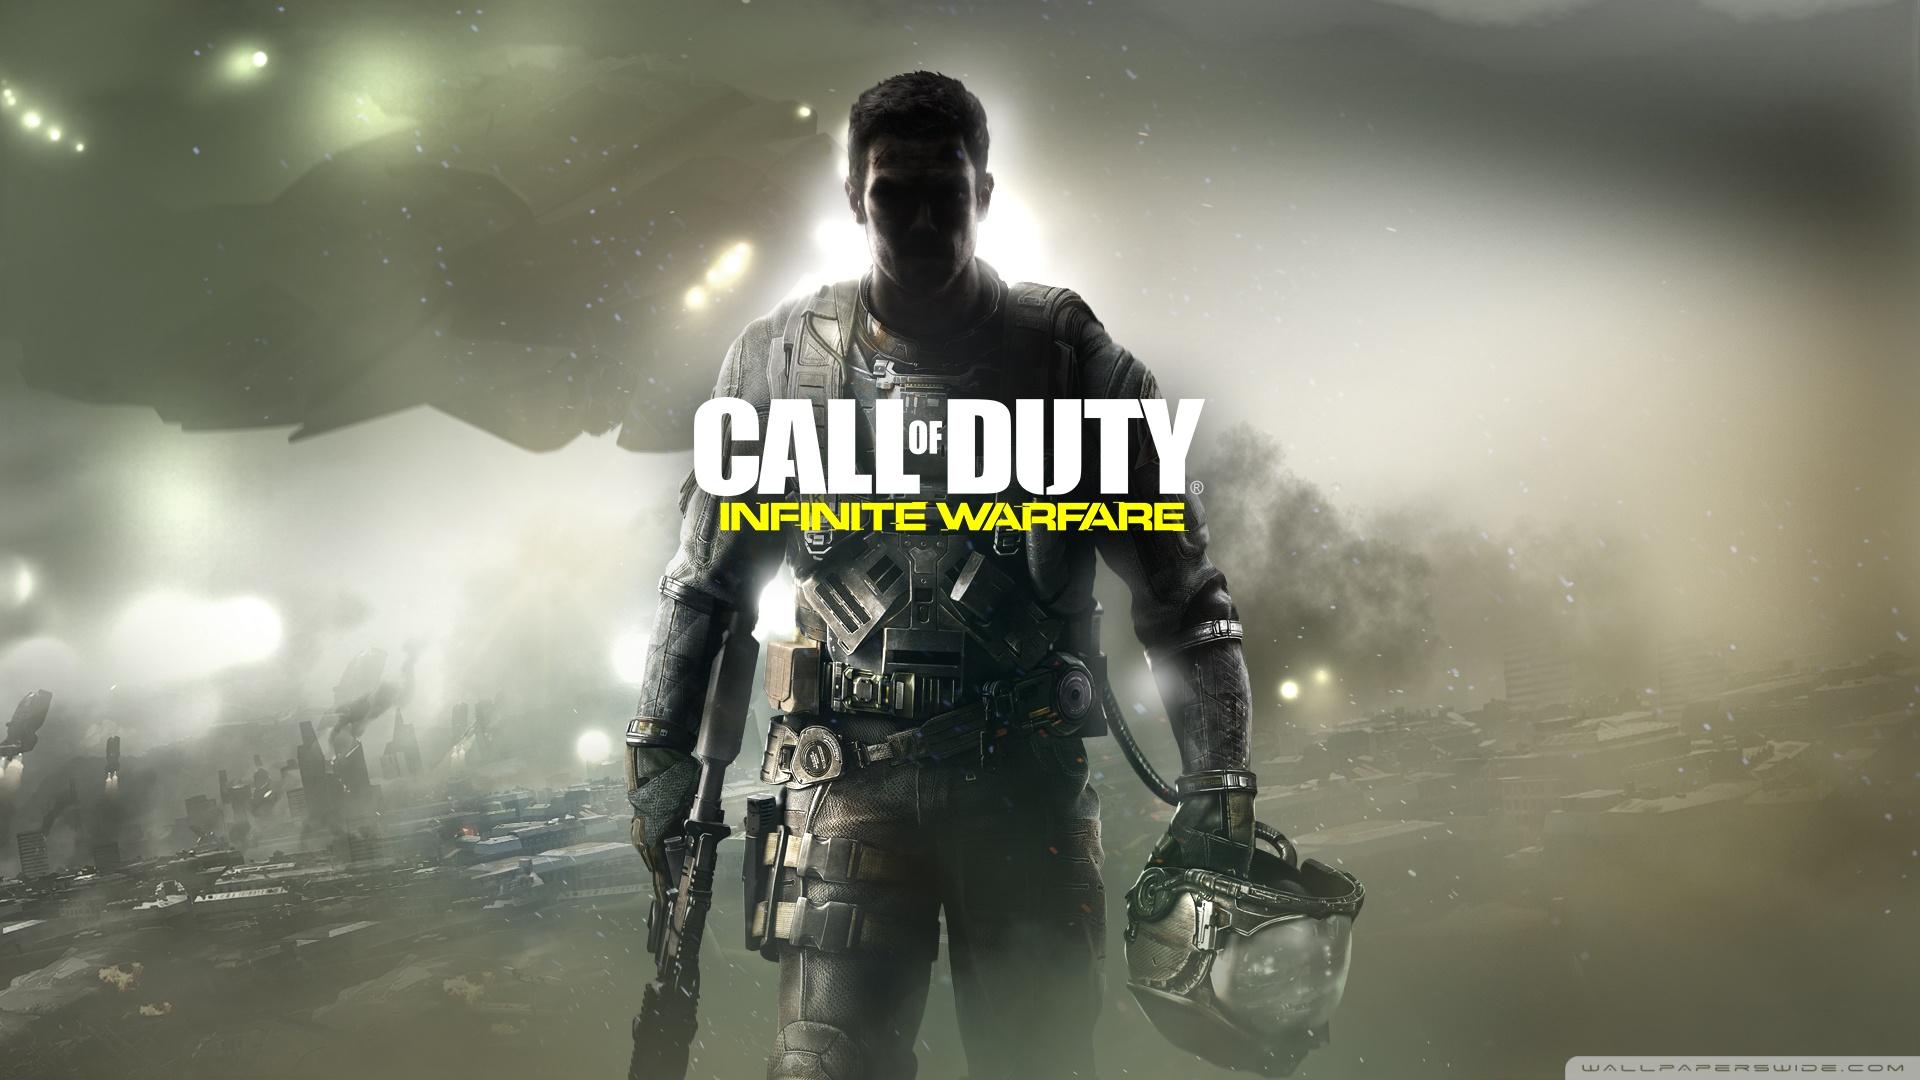 call_of_duty_infinite_warfare_2-wallpaper-1920x1080